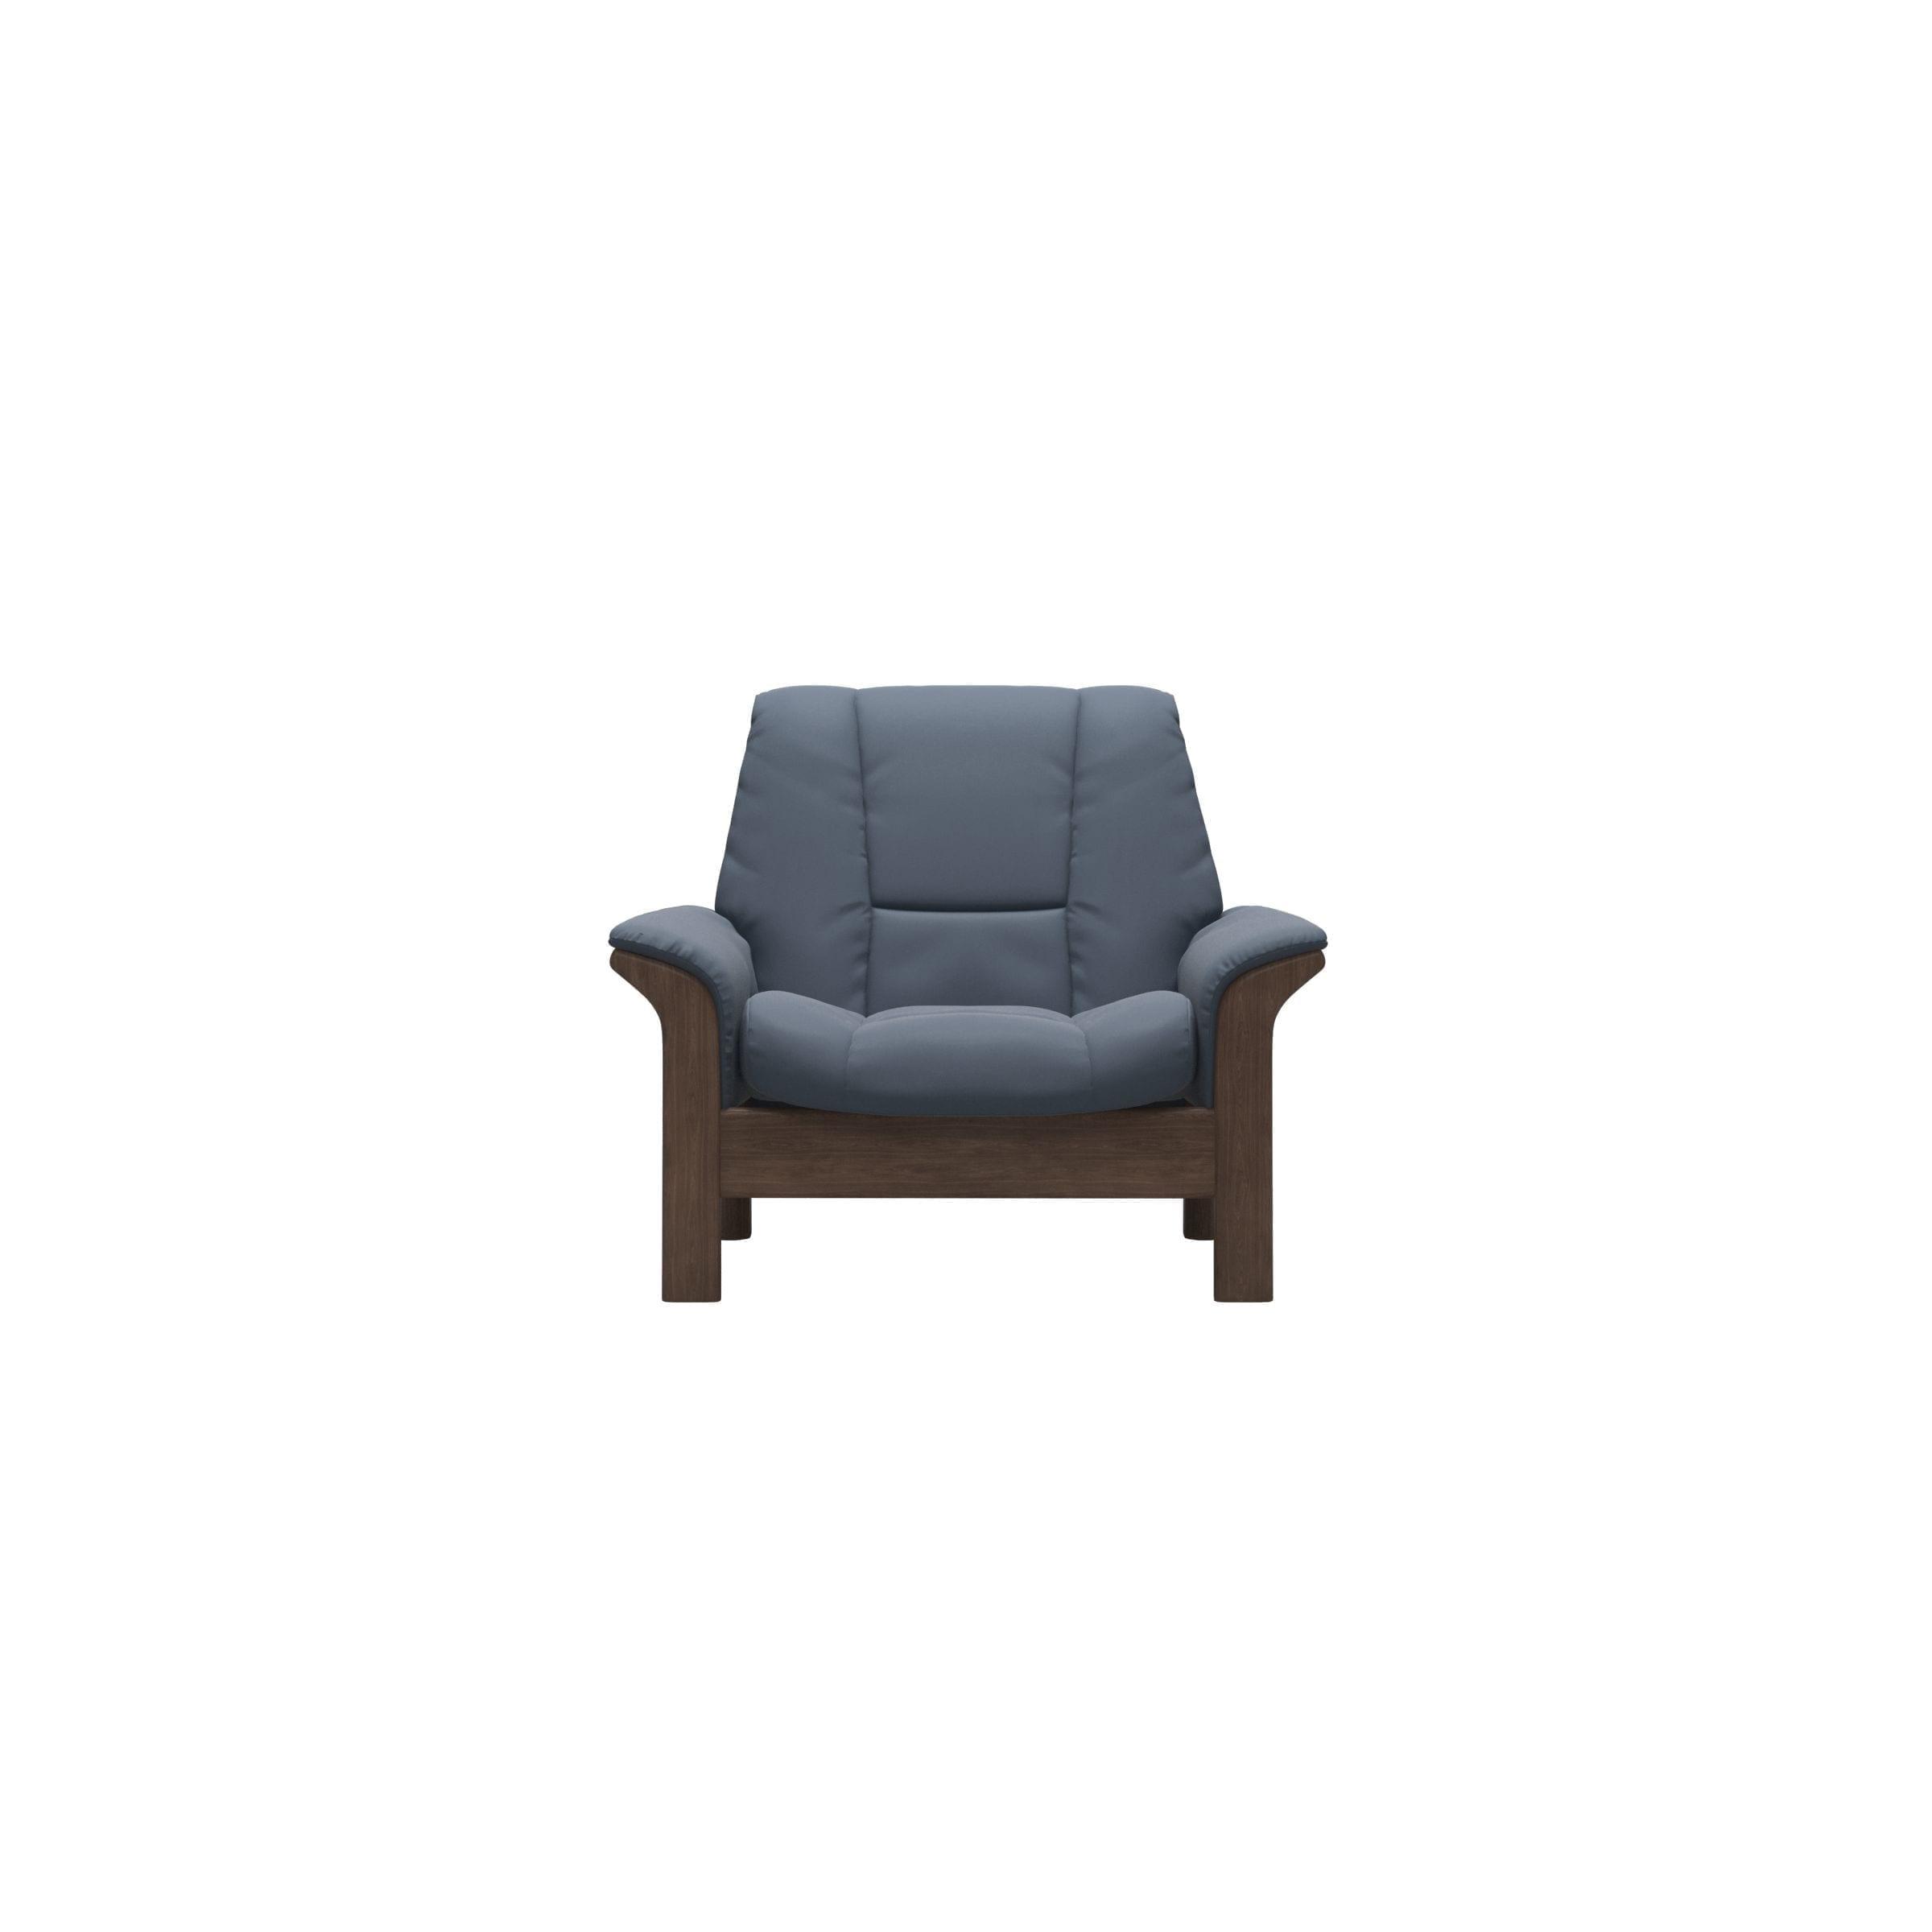 Buckingham Chair Low